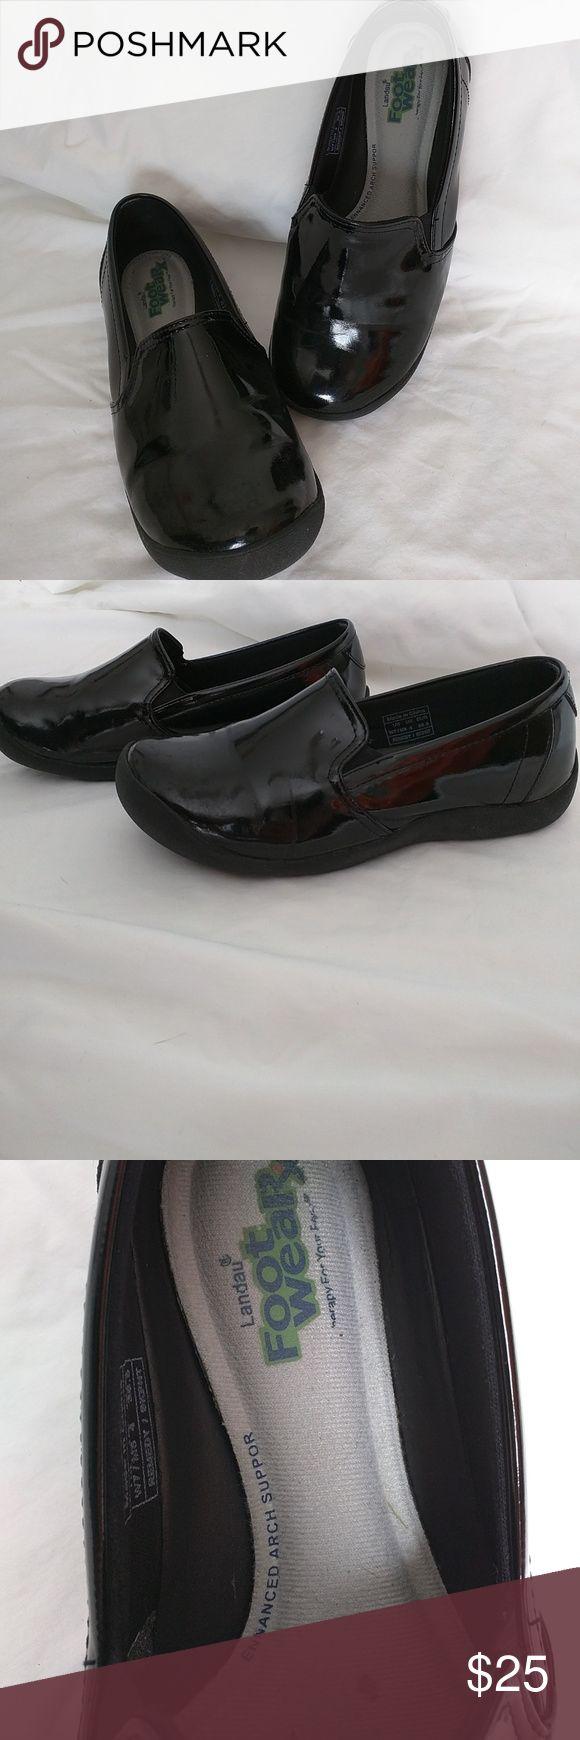 Landau Nursing shoes. Size 8.5 Only worn a handful of times. Patent leather outer shoe. Super comfy memory foam inner sole. Landau Shoes Mules & Clogs